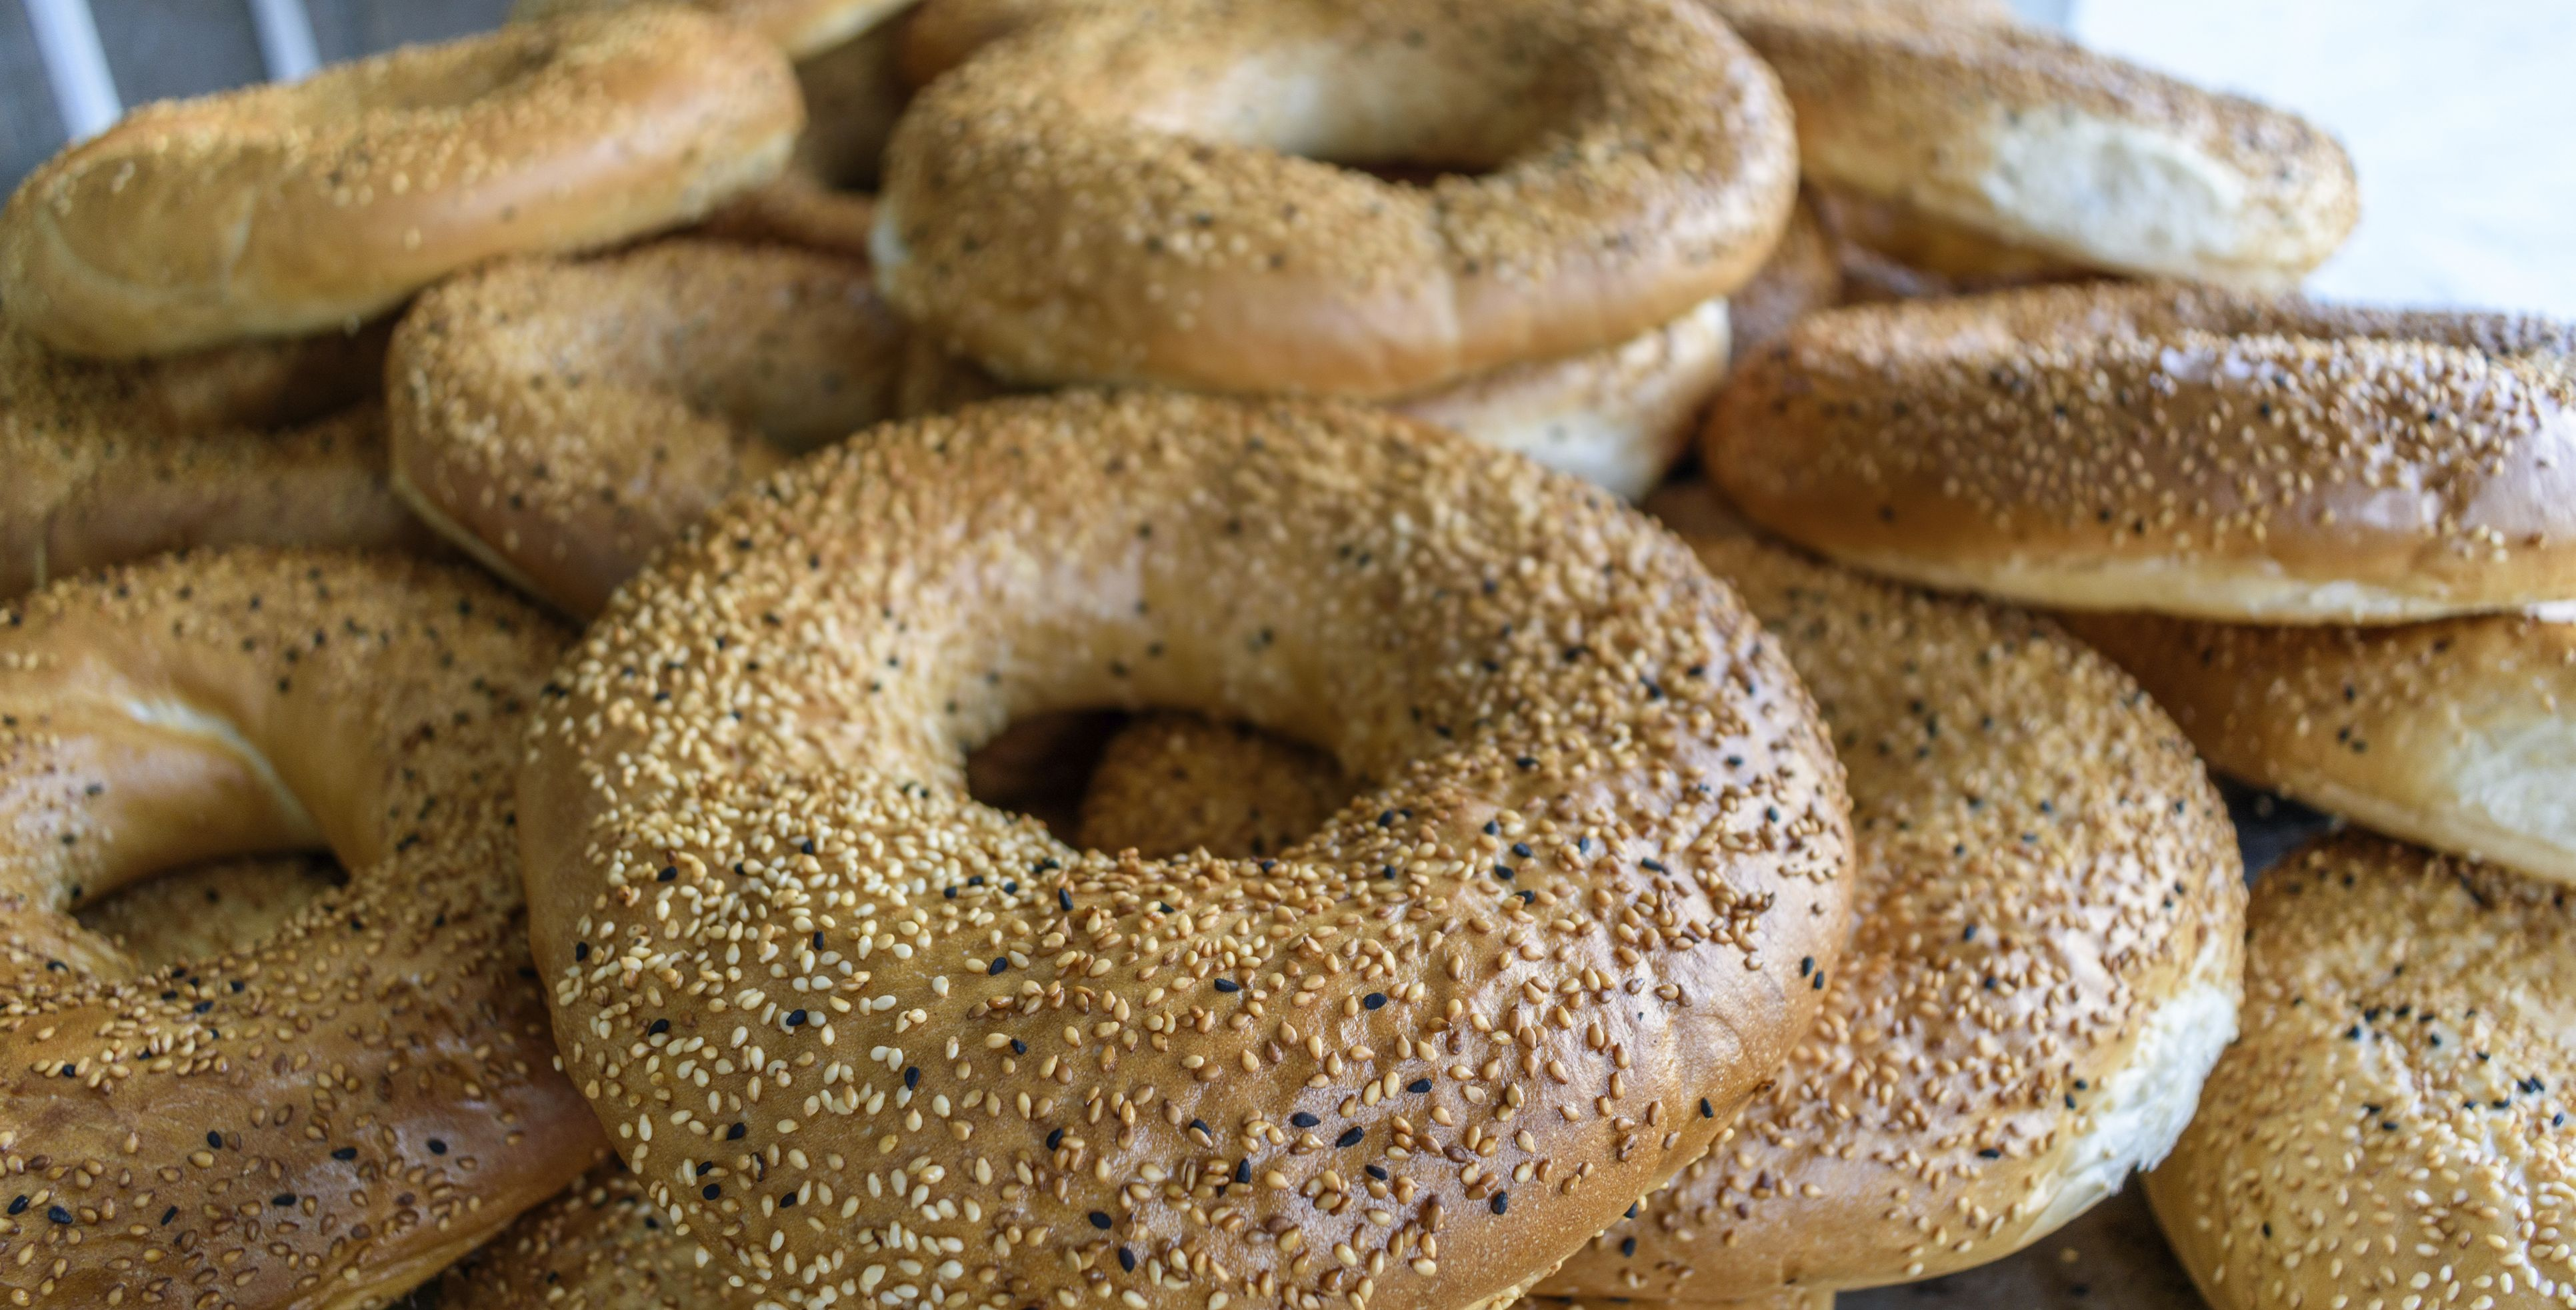 Close up of bagel shaped sesame seed bread in Jordan.